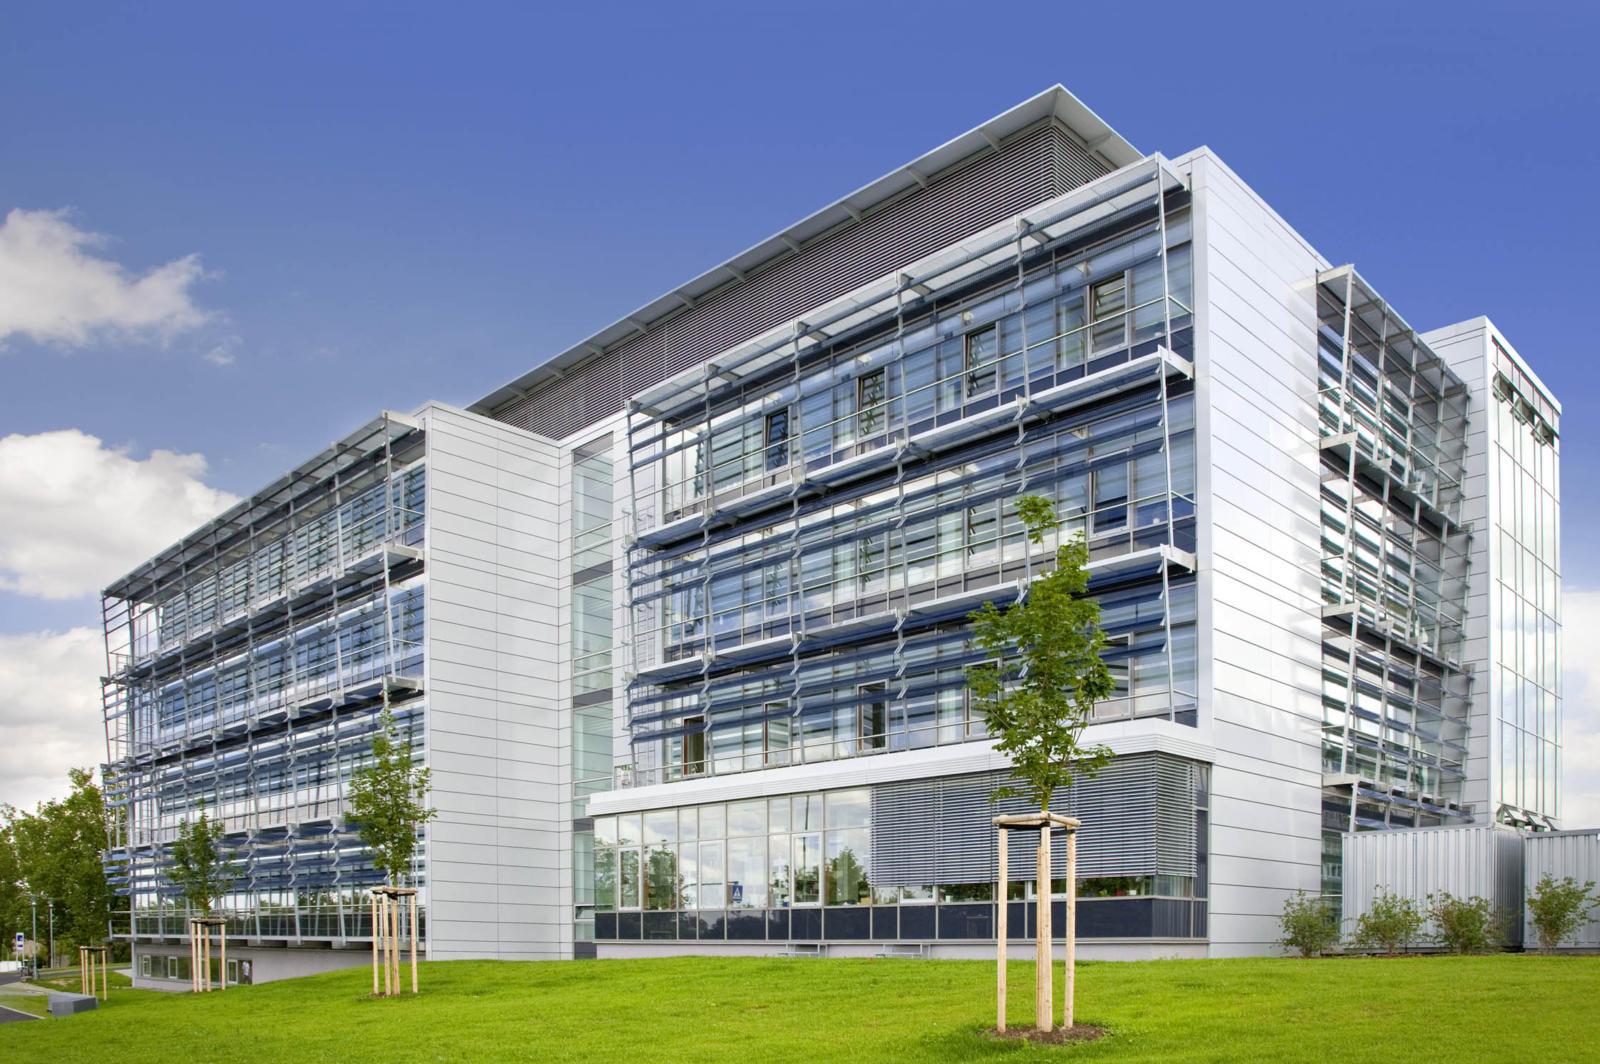 Chemiezentrum der Universität Würzbug pictures | Fisair